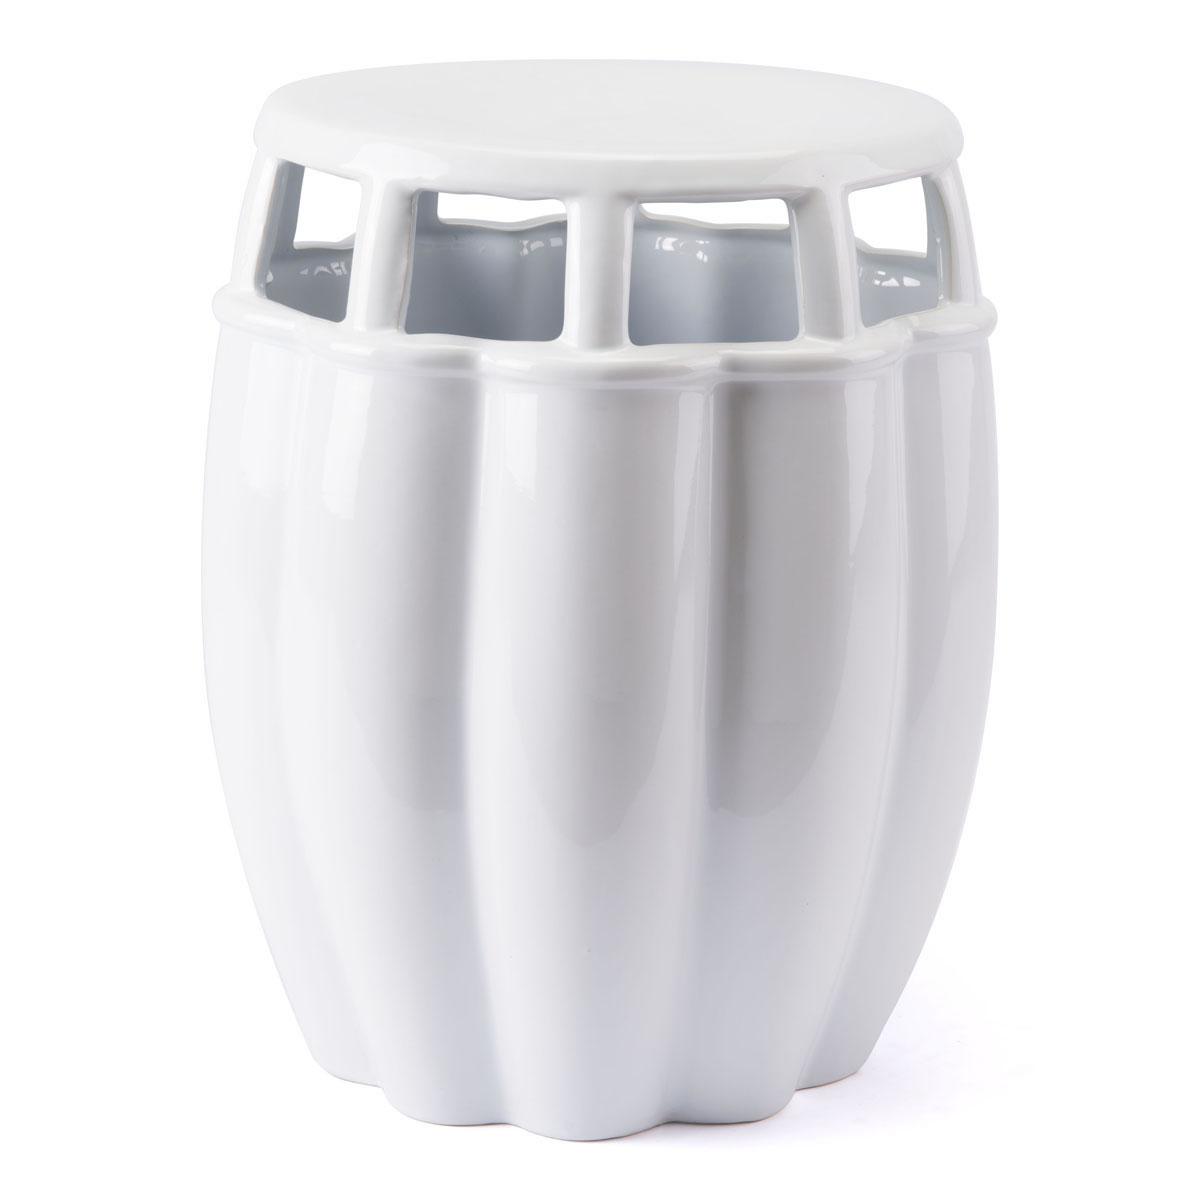 "14.4"" x 14.4"" x 17.1"" White, Ceramic, Seat"